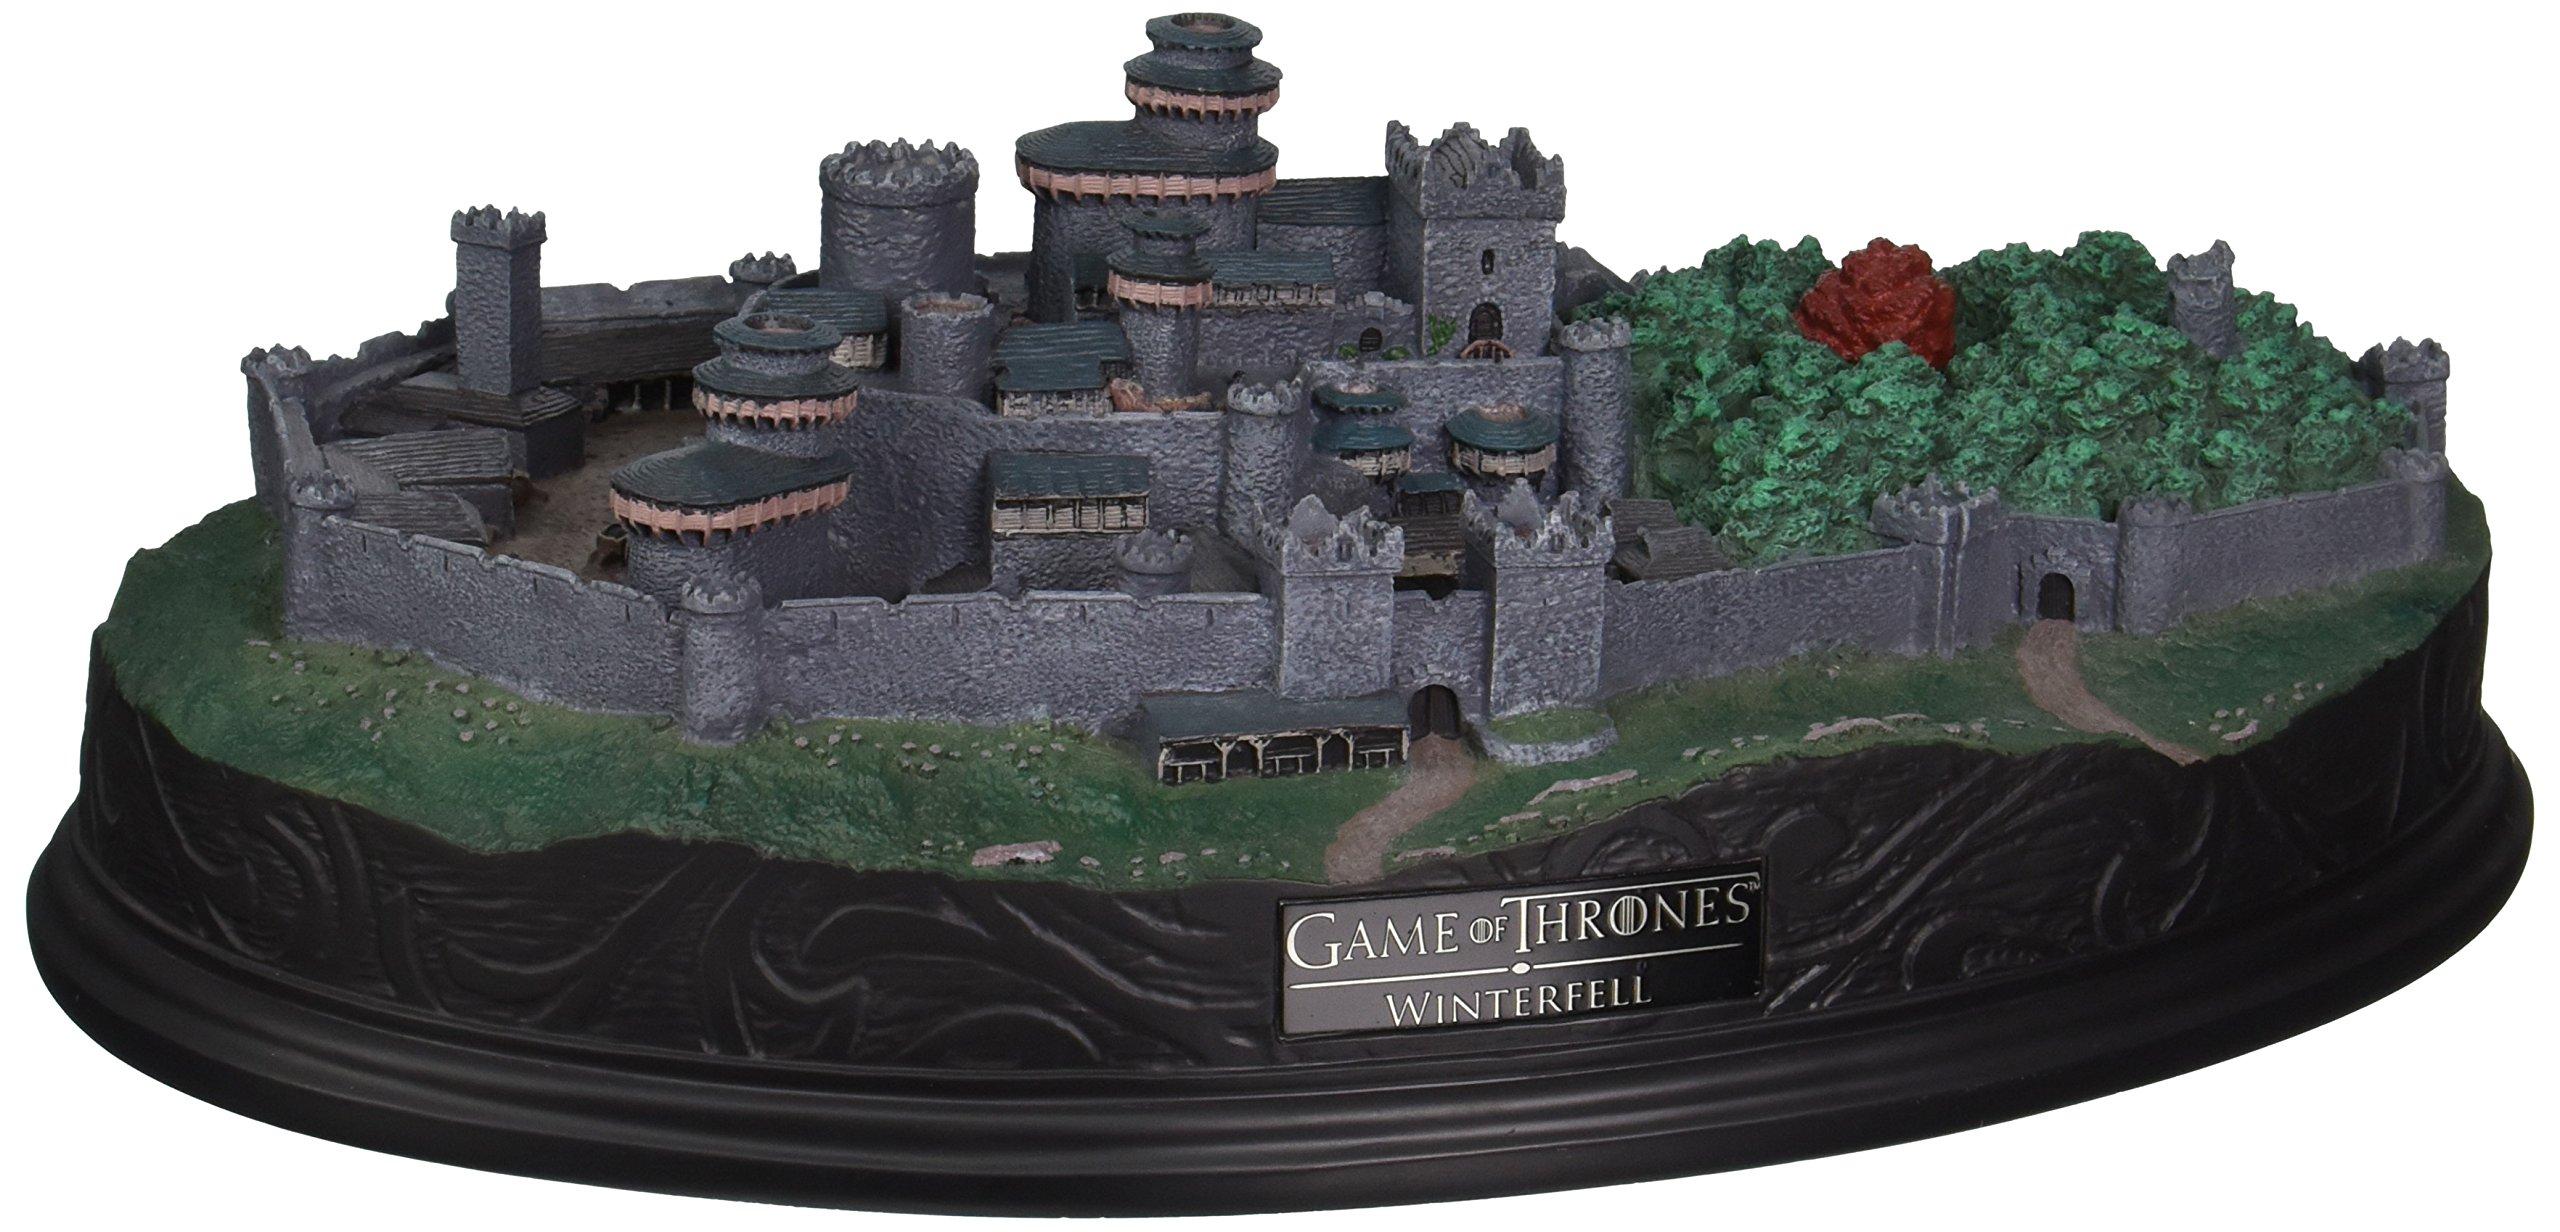 Factory Entertainment Game of Thrones Winterfell Desktop Sculpture